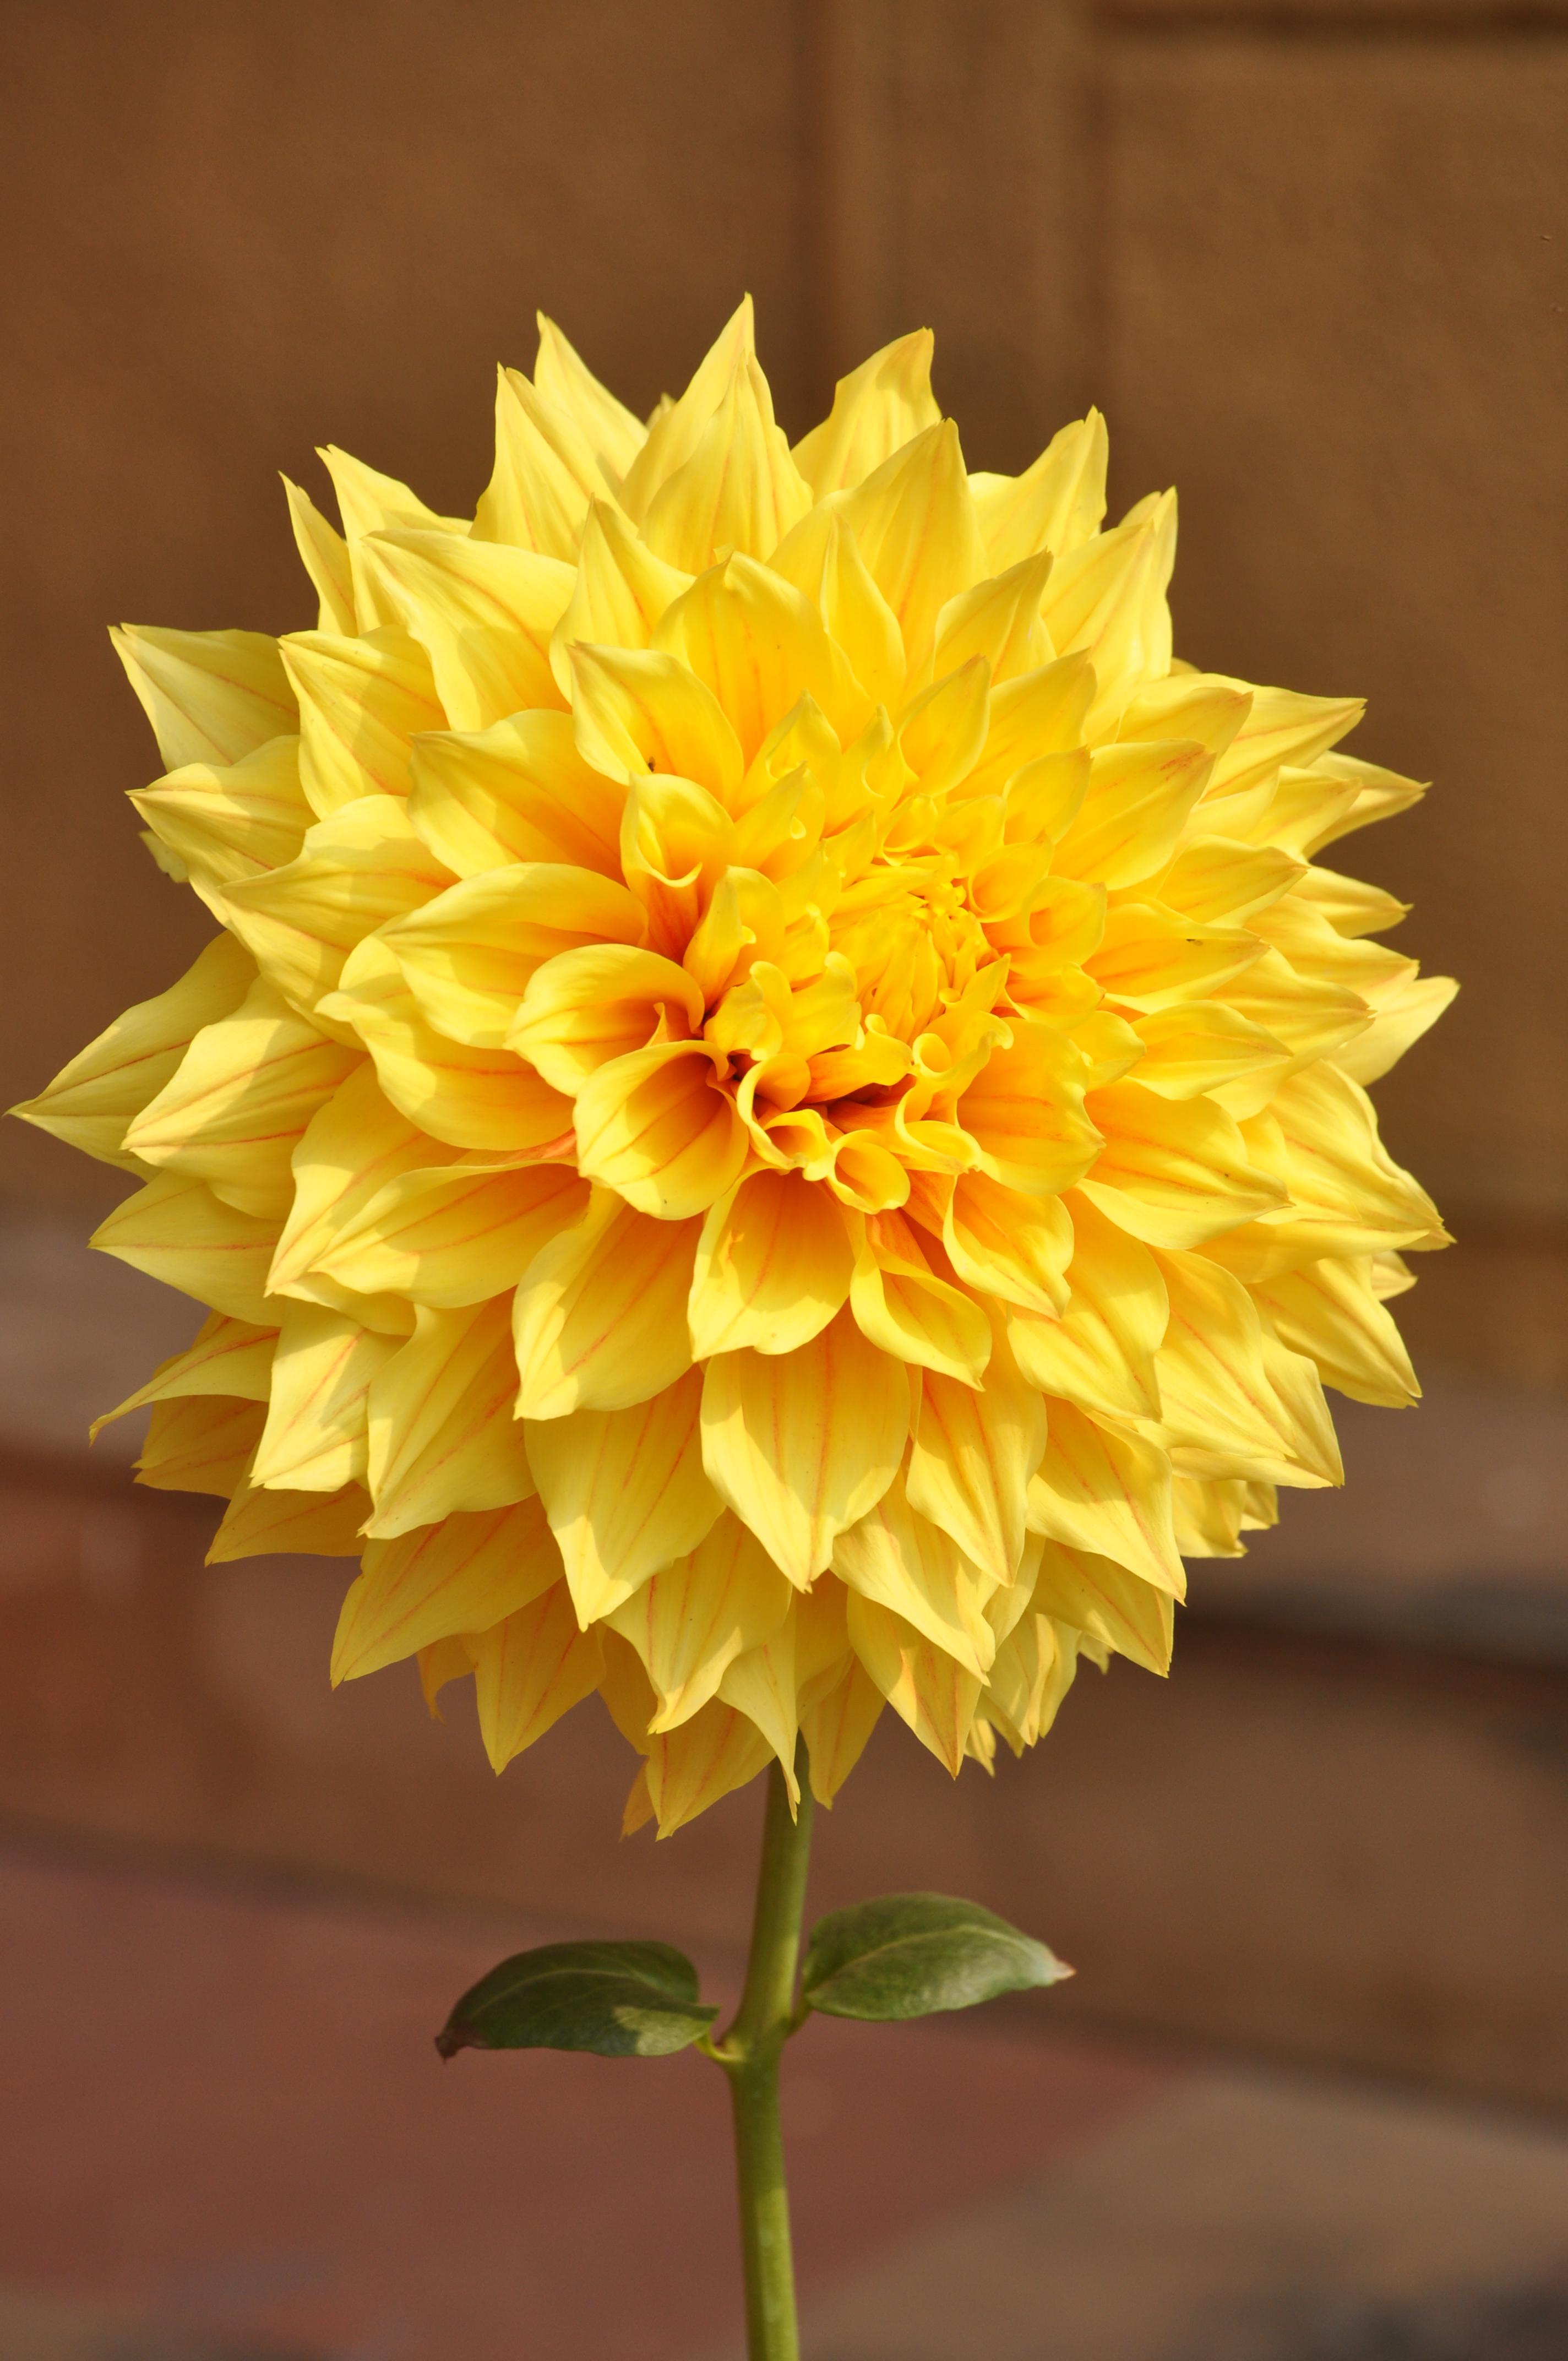 yellow dahlia flower - photo #24